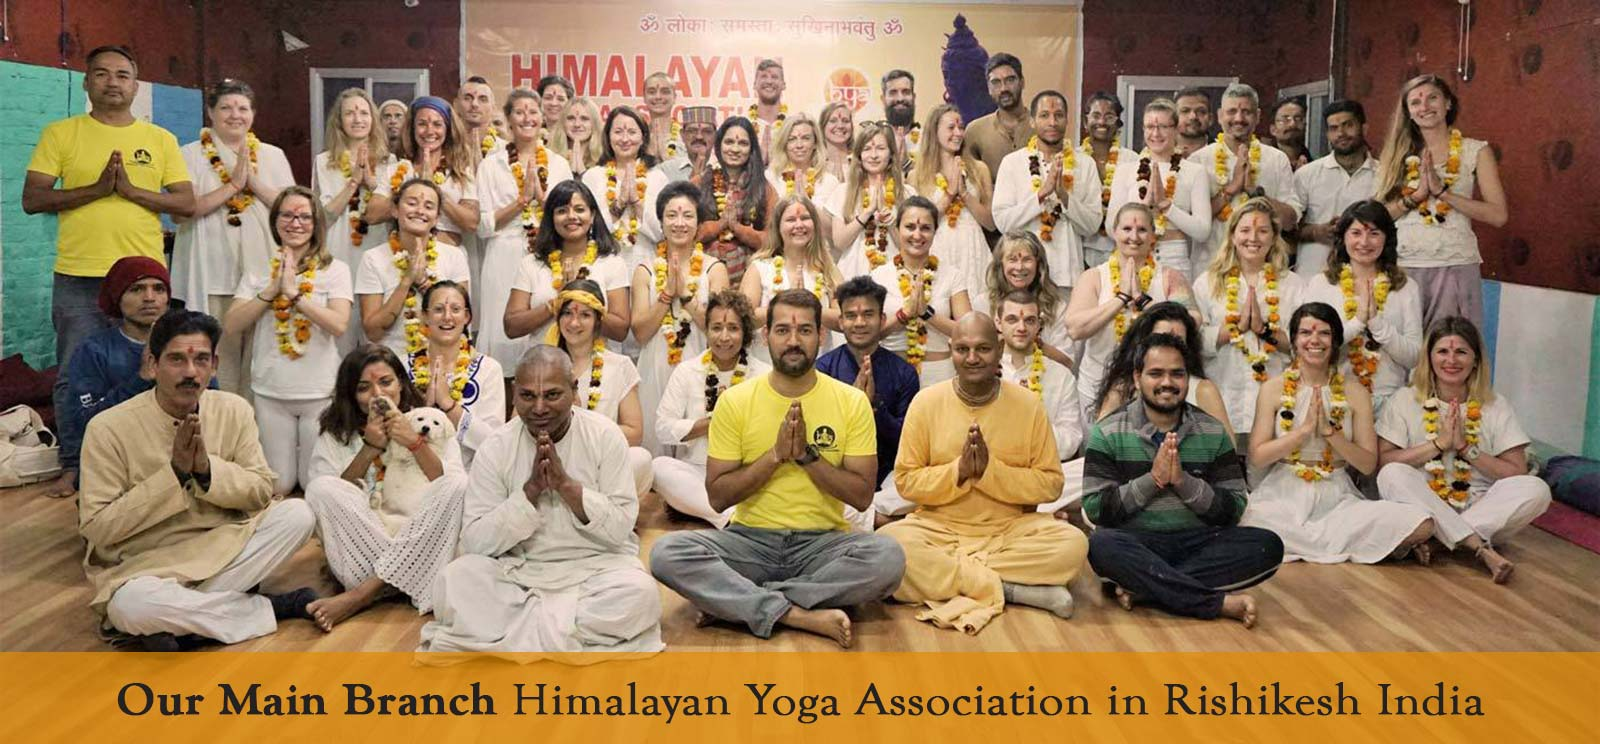 Yoga-Teacher-Training-in-Rishikesh-India-RYT200,-RYT300,-RYT500